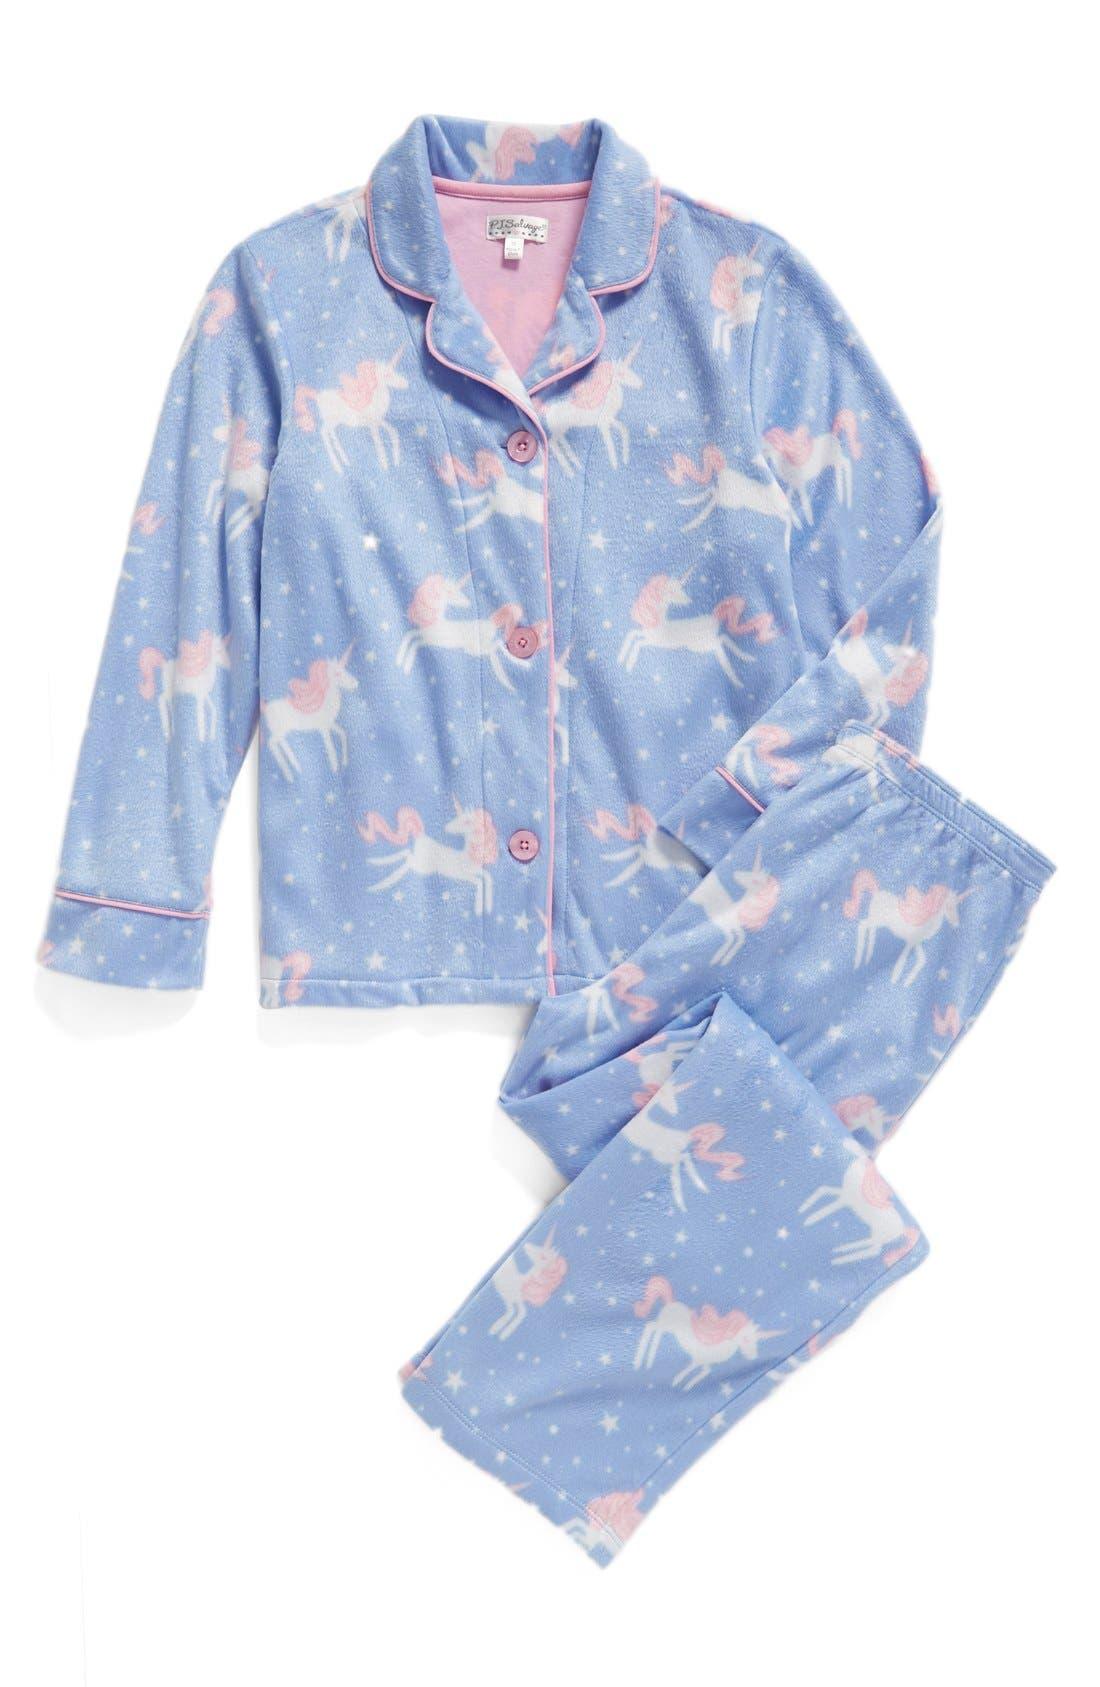 Main Image - PJ Salvage Unicorn Two-Piece Pajamas (Little Girls & Big Girls)